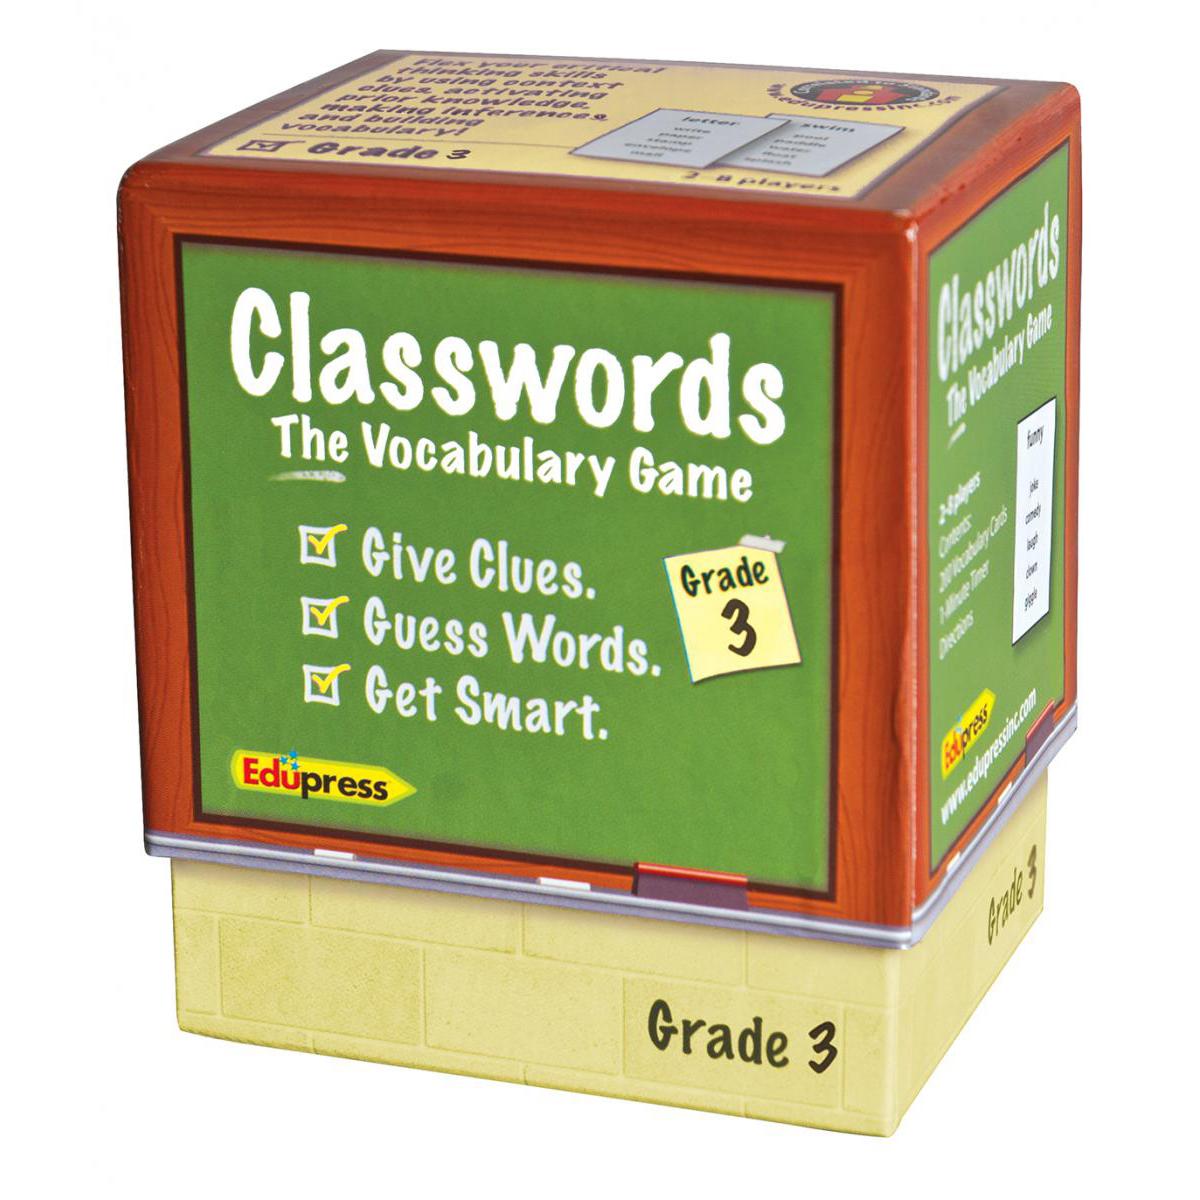 Classwords The Vocabulary Game Gr. 3